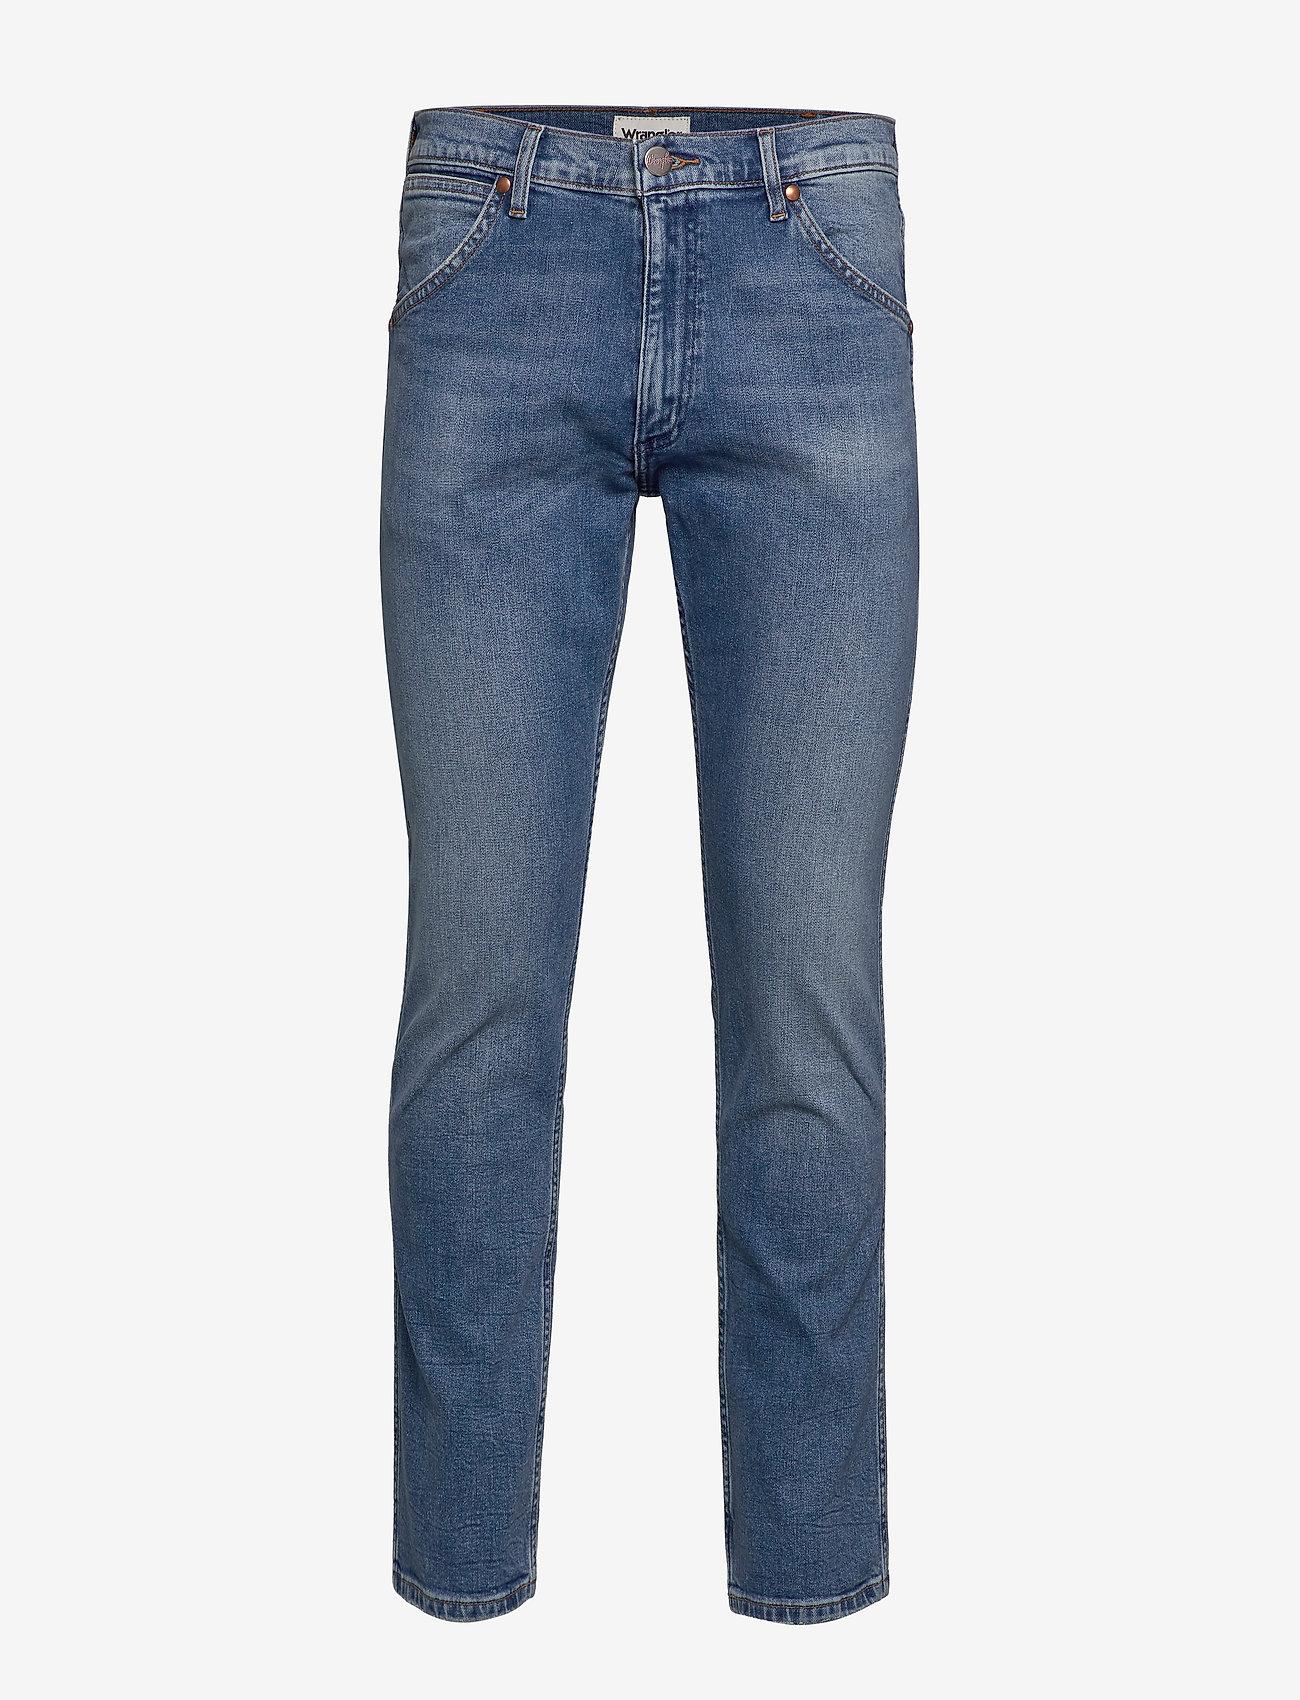 Wrangler 11MWZ - Jeans 3 YEARS vTYVKGPq